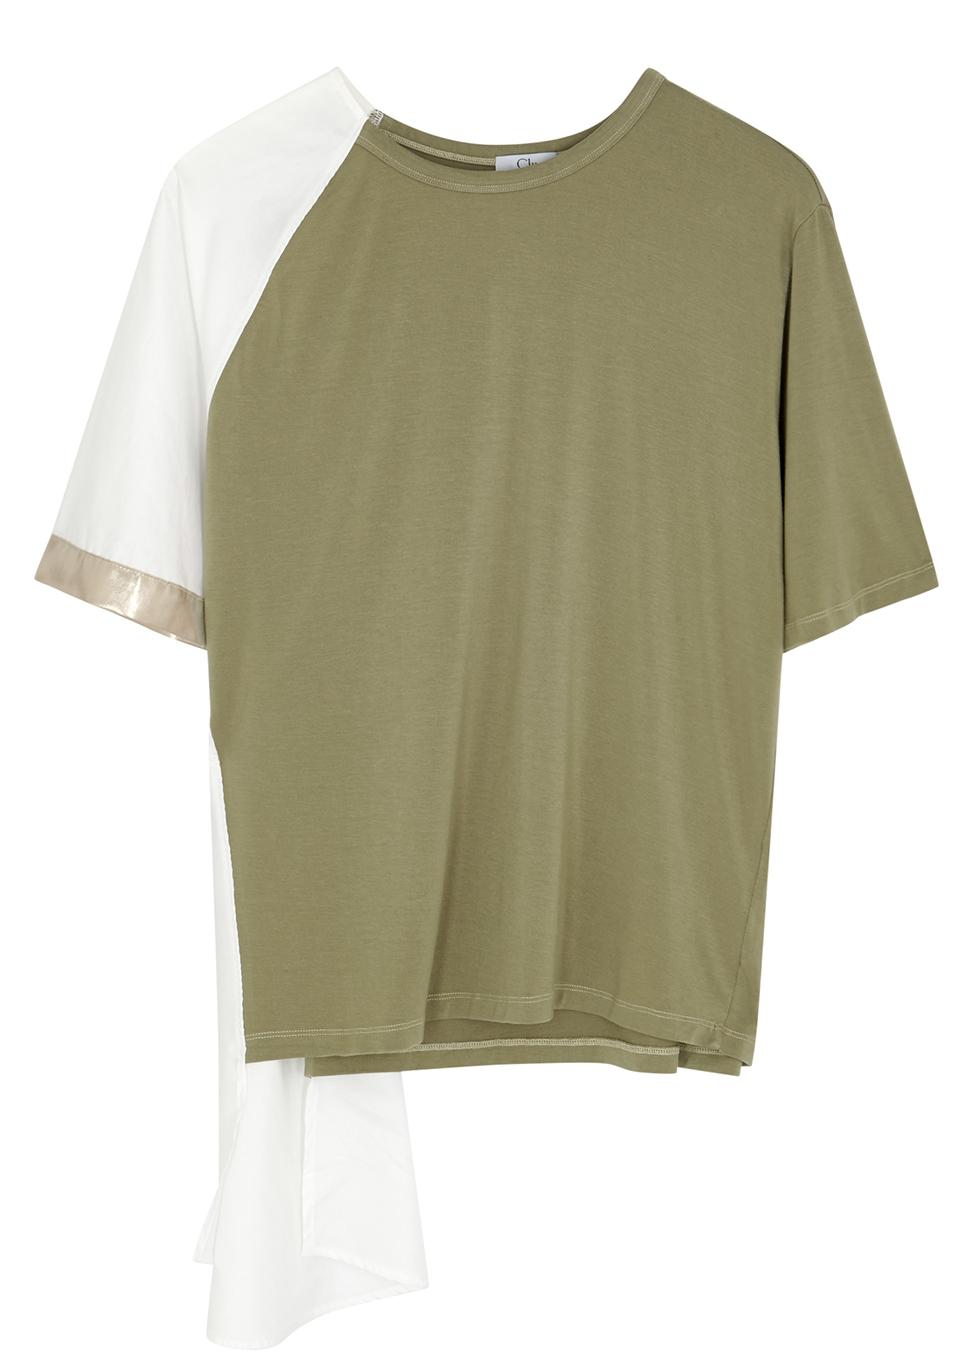 Olive asymmetric Tencel T-shirt - Clu